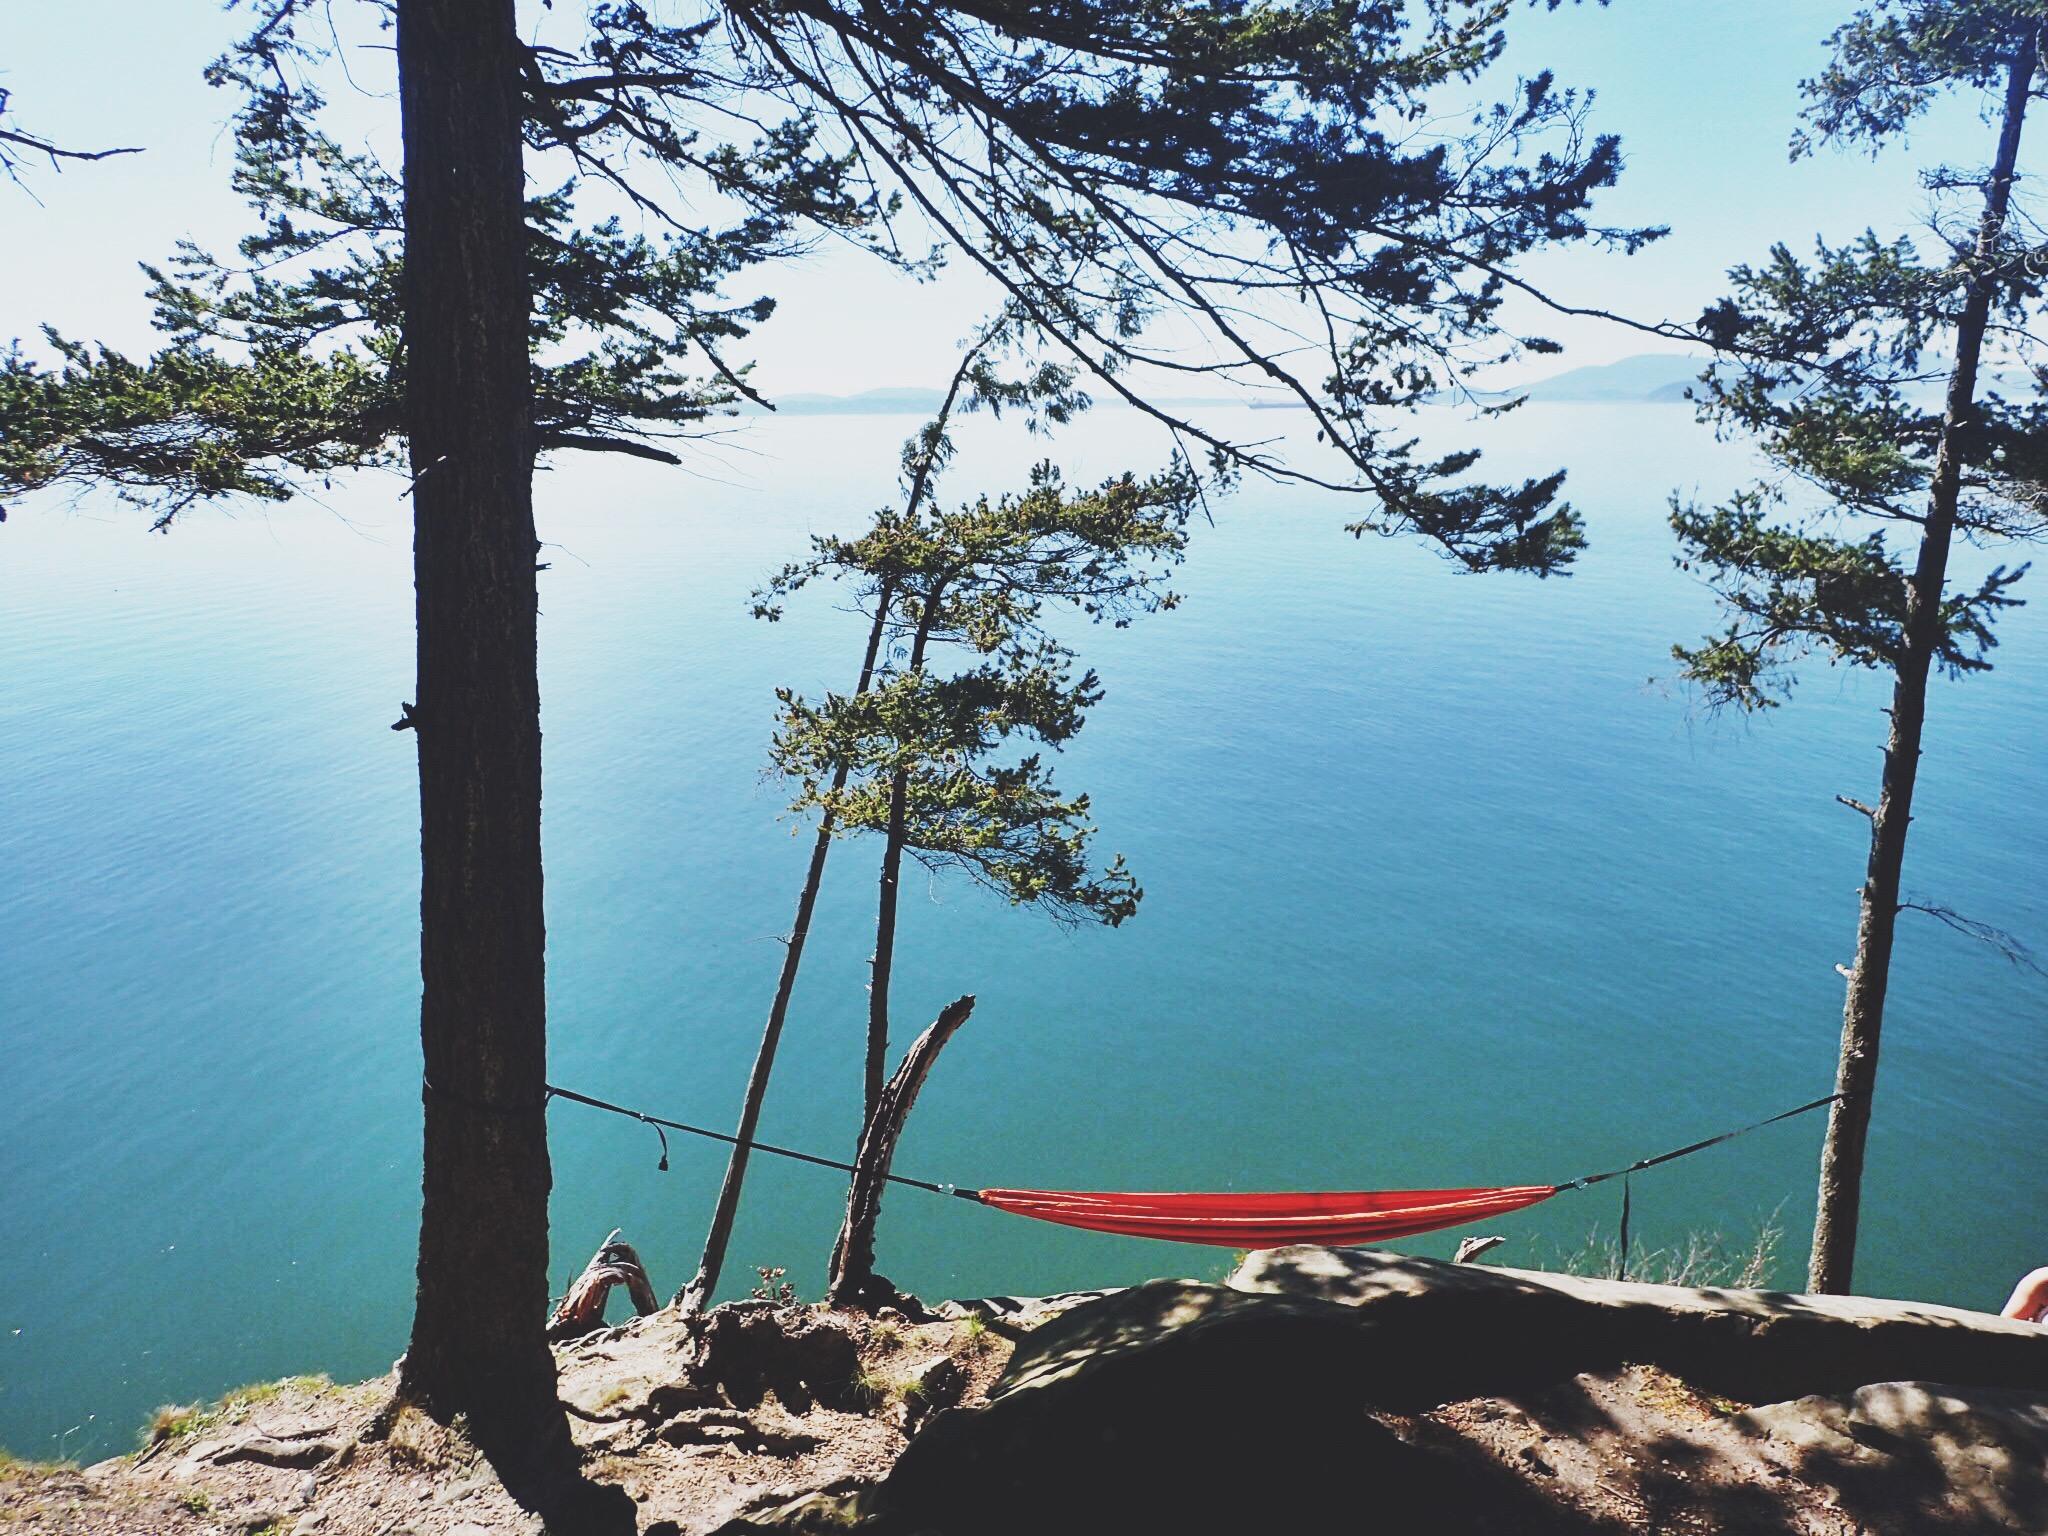 thermarest hammock